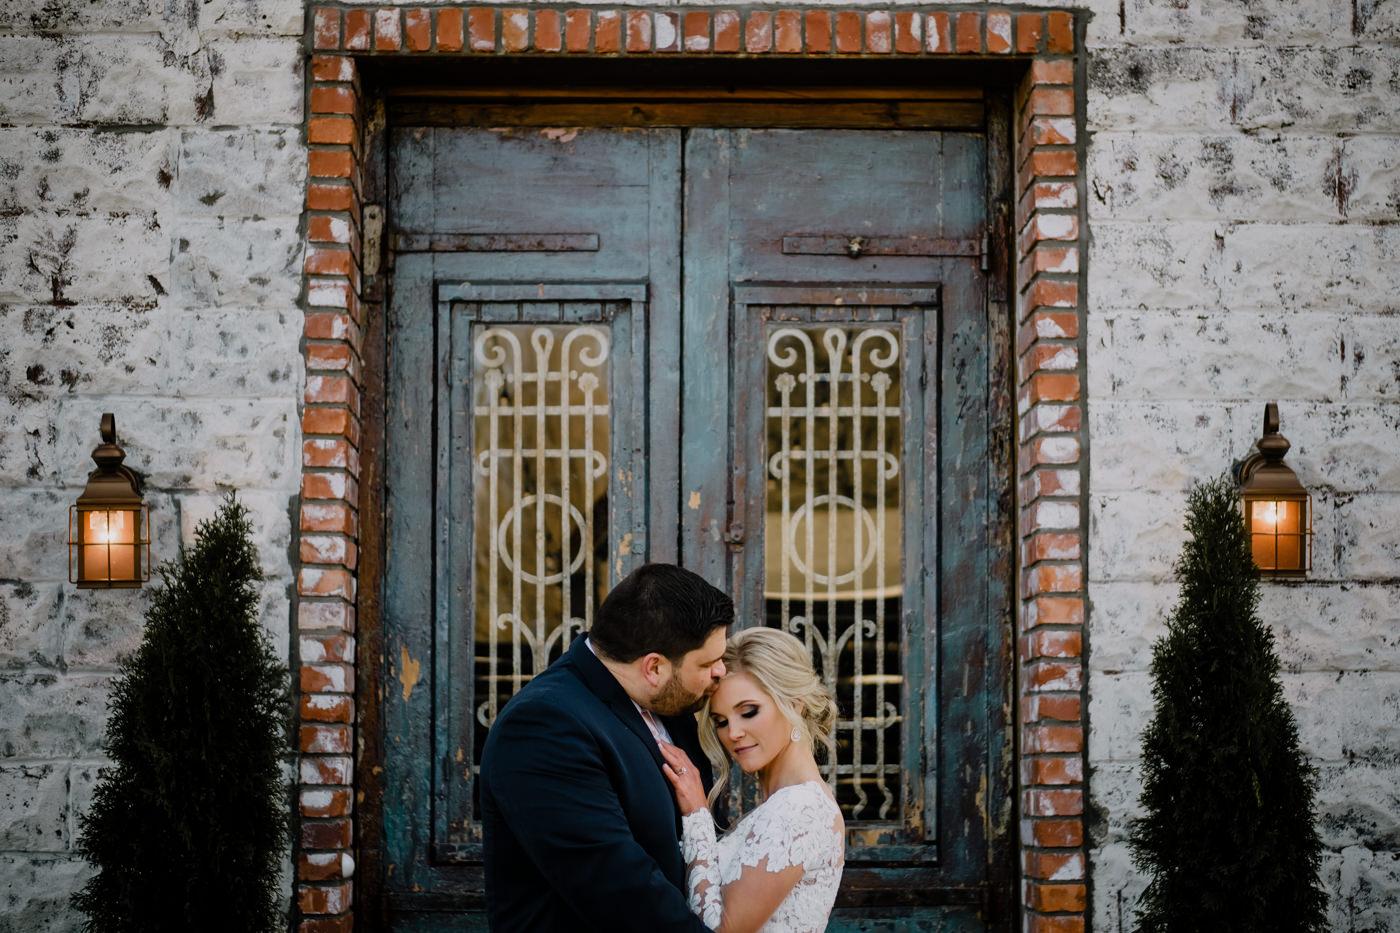 ravington.wedding.northwestarkansas.mileswittboyer-24.jpg